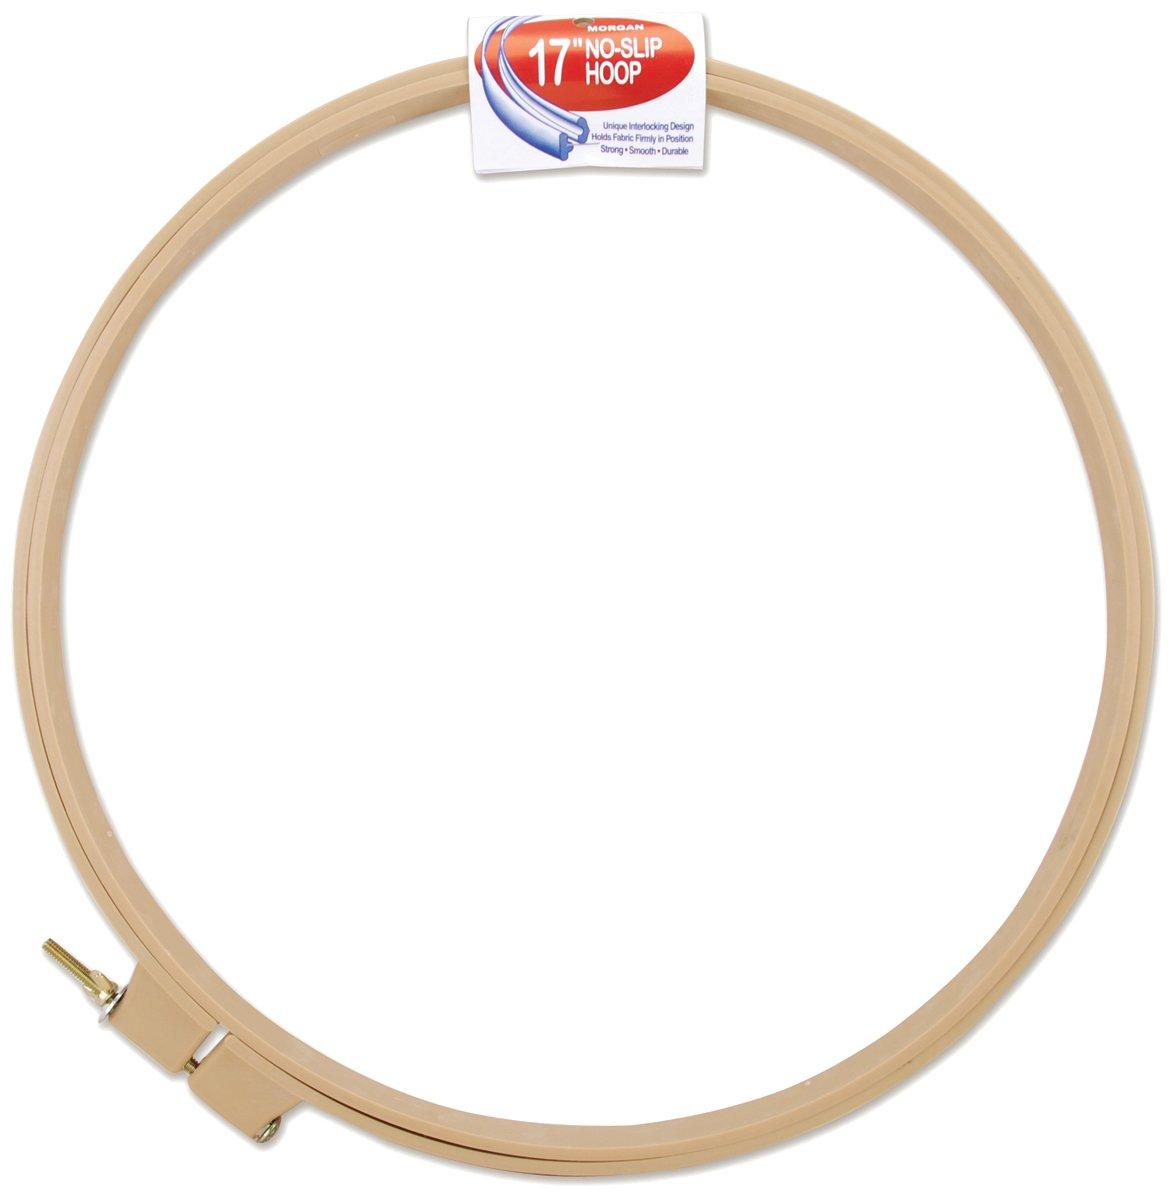 Morgan Products 133 133 Plastic No-Slip Hoop, 10-Inch